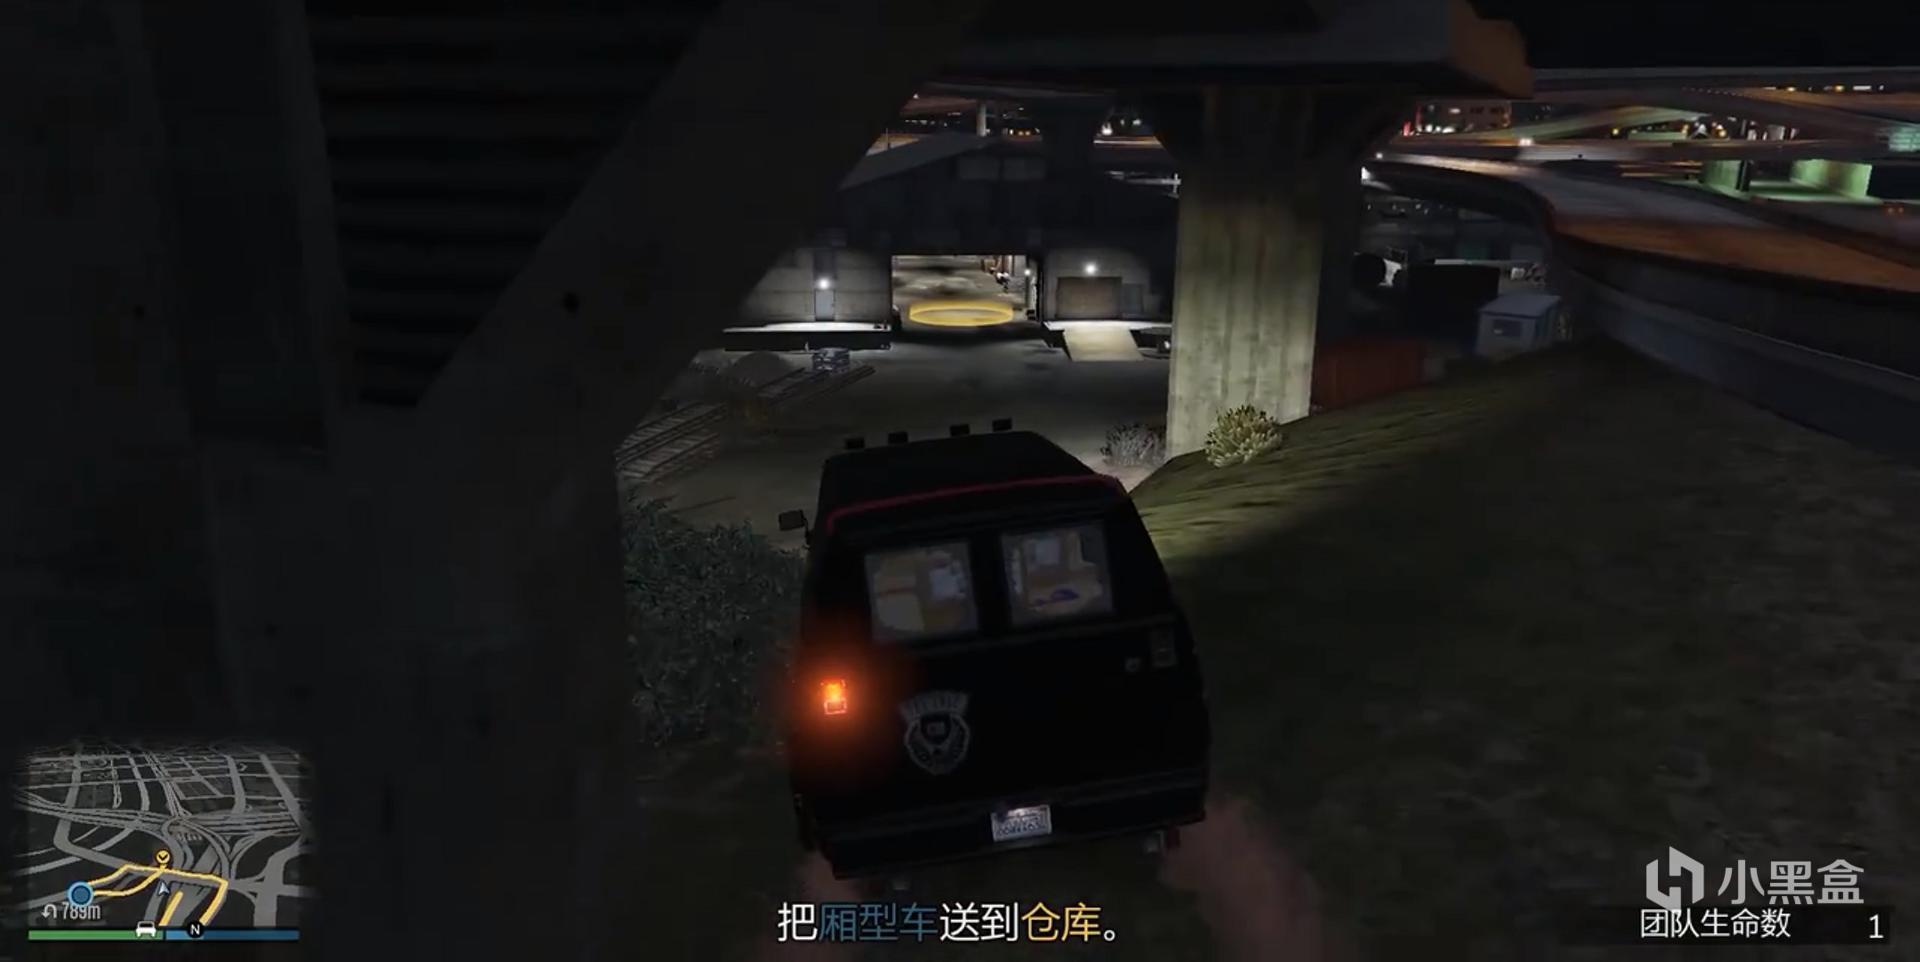 GTA5 首轮募资教程插图29